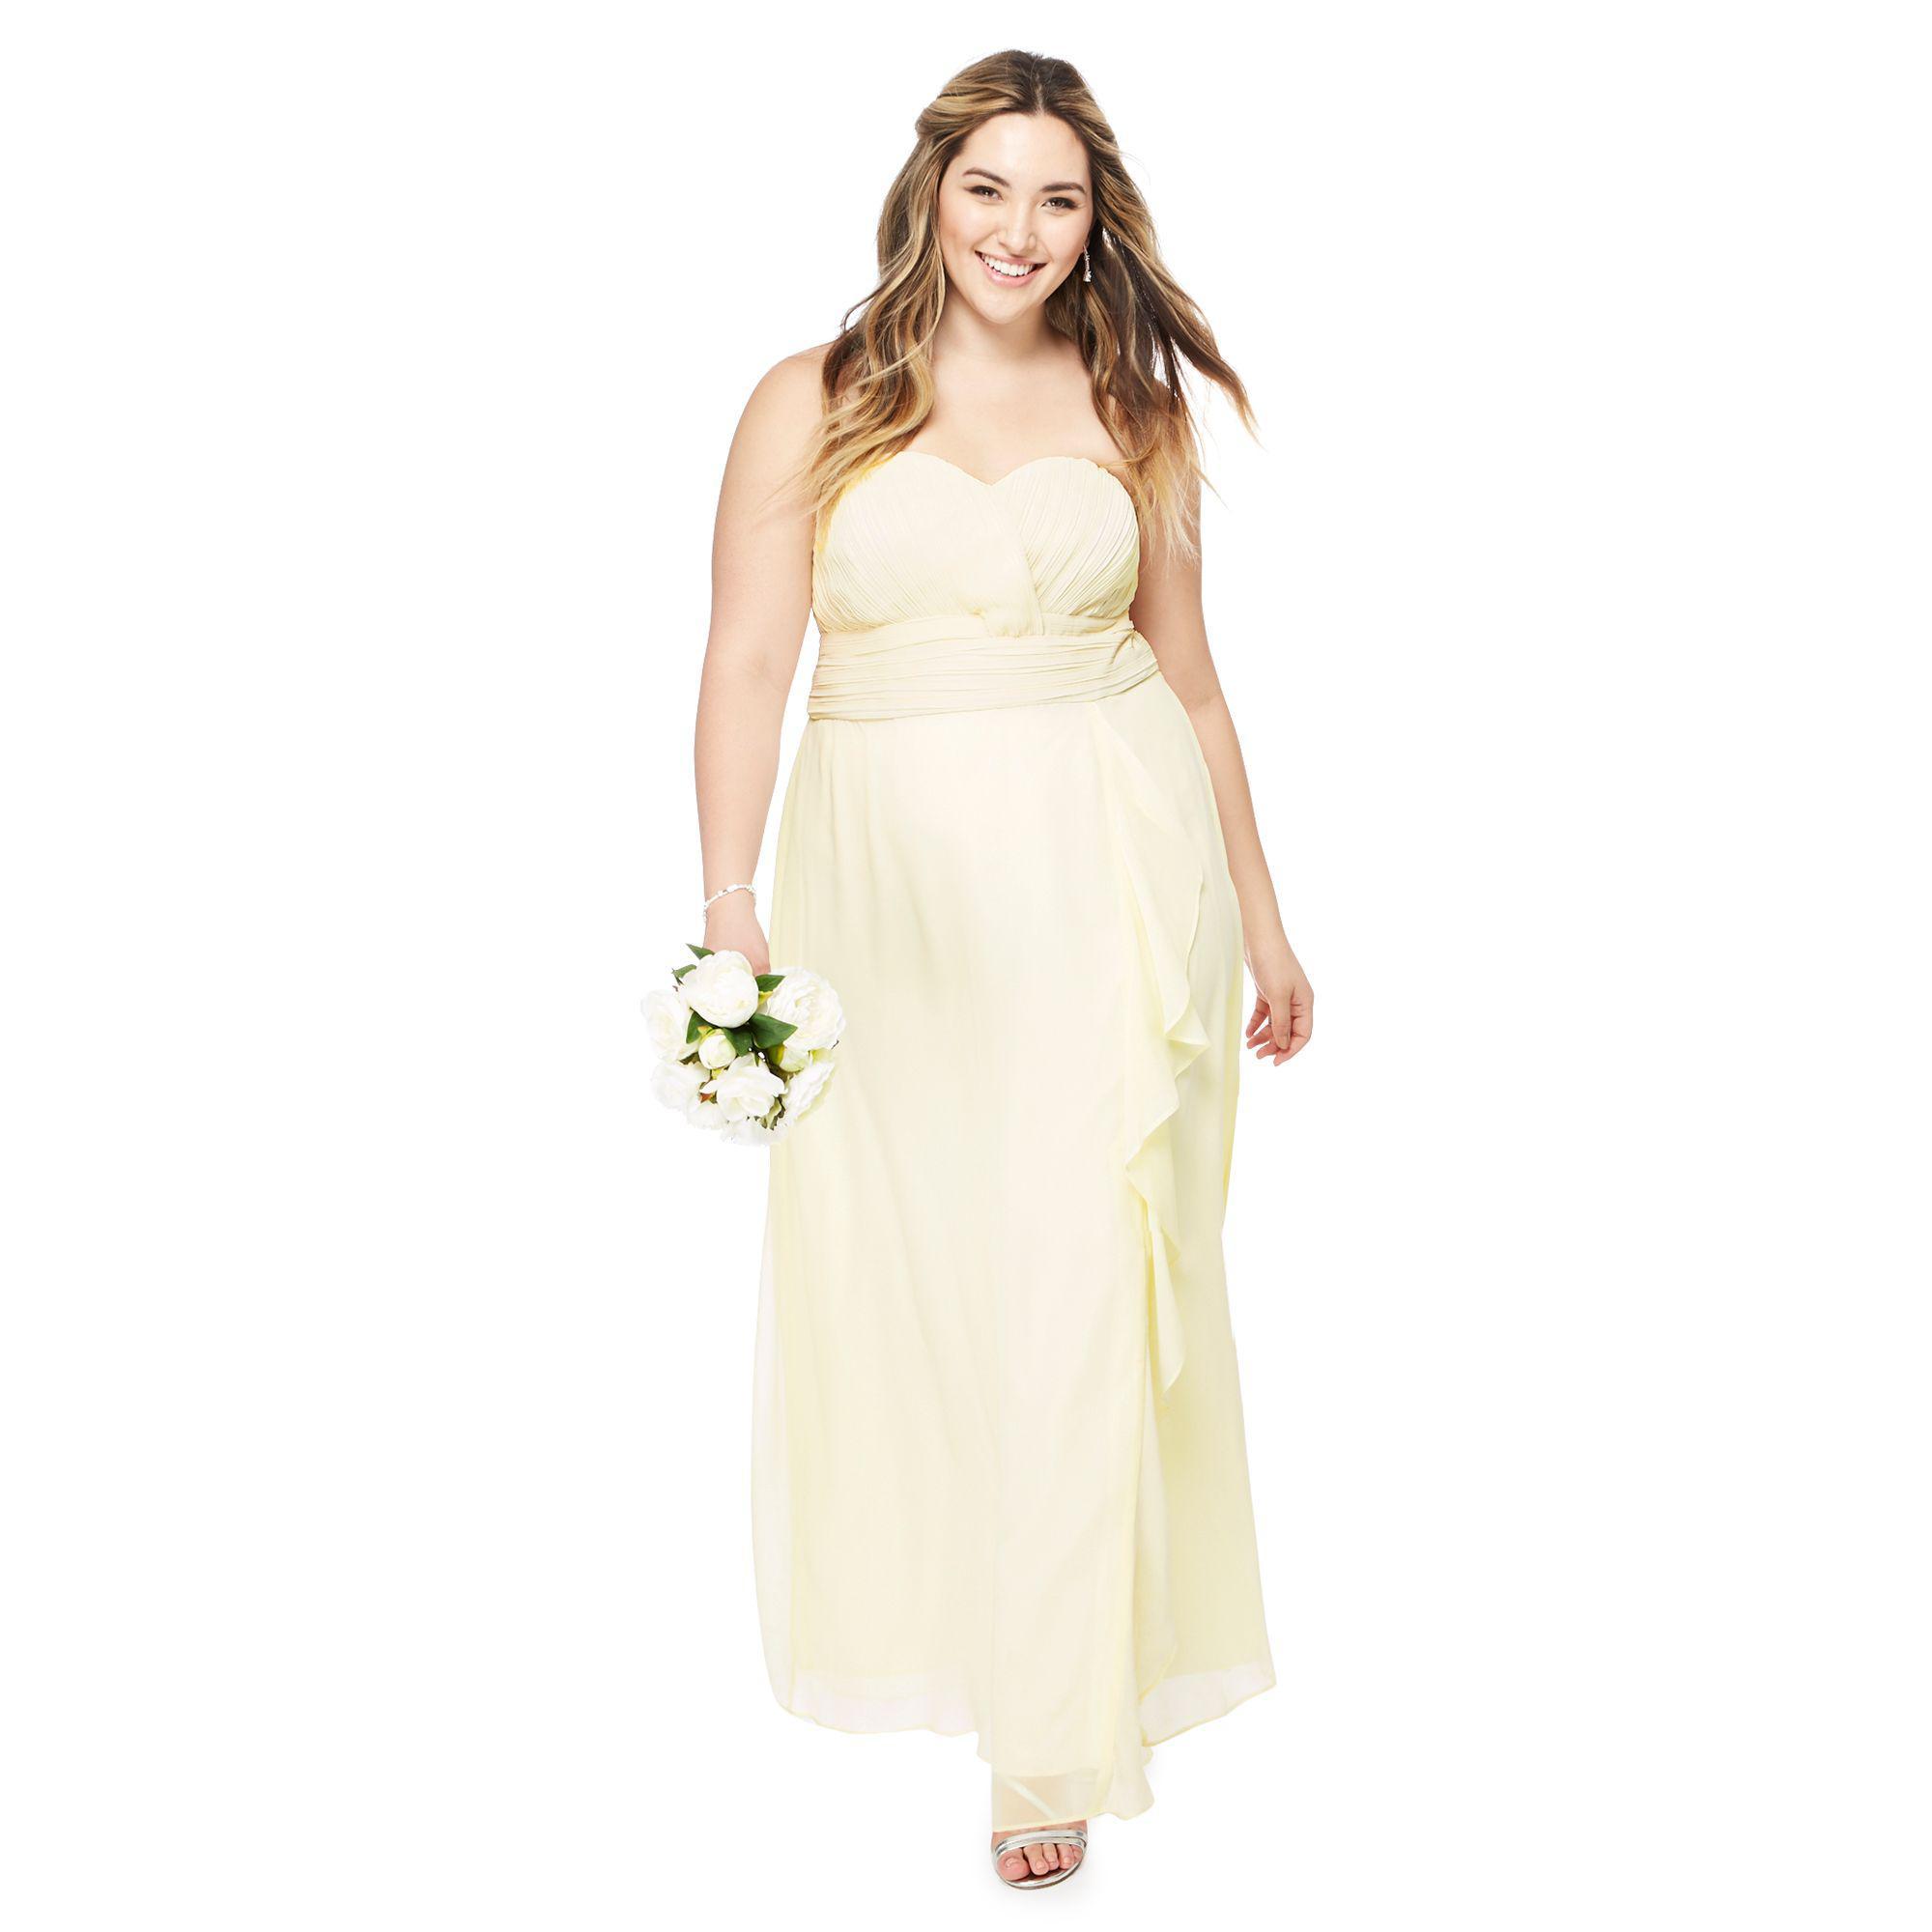 617e1a9d17 Début Yellow Chiffon 'sara' Strapless Plus Size Bridesmaid Dress in ...